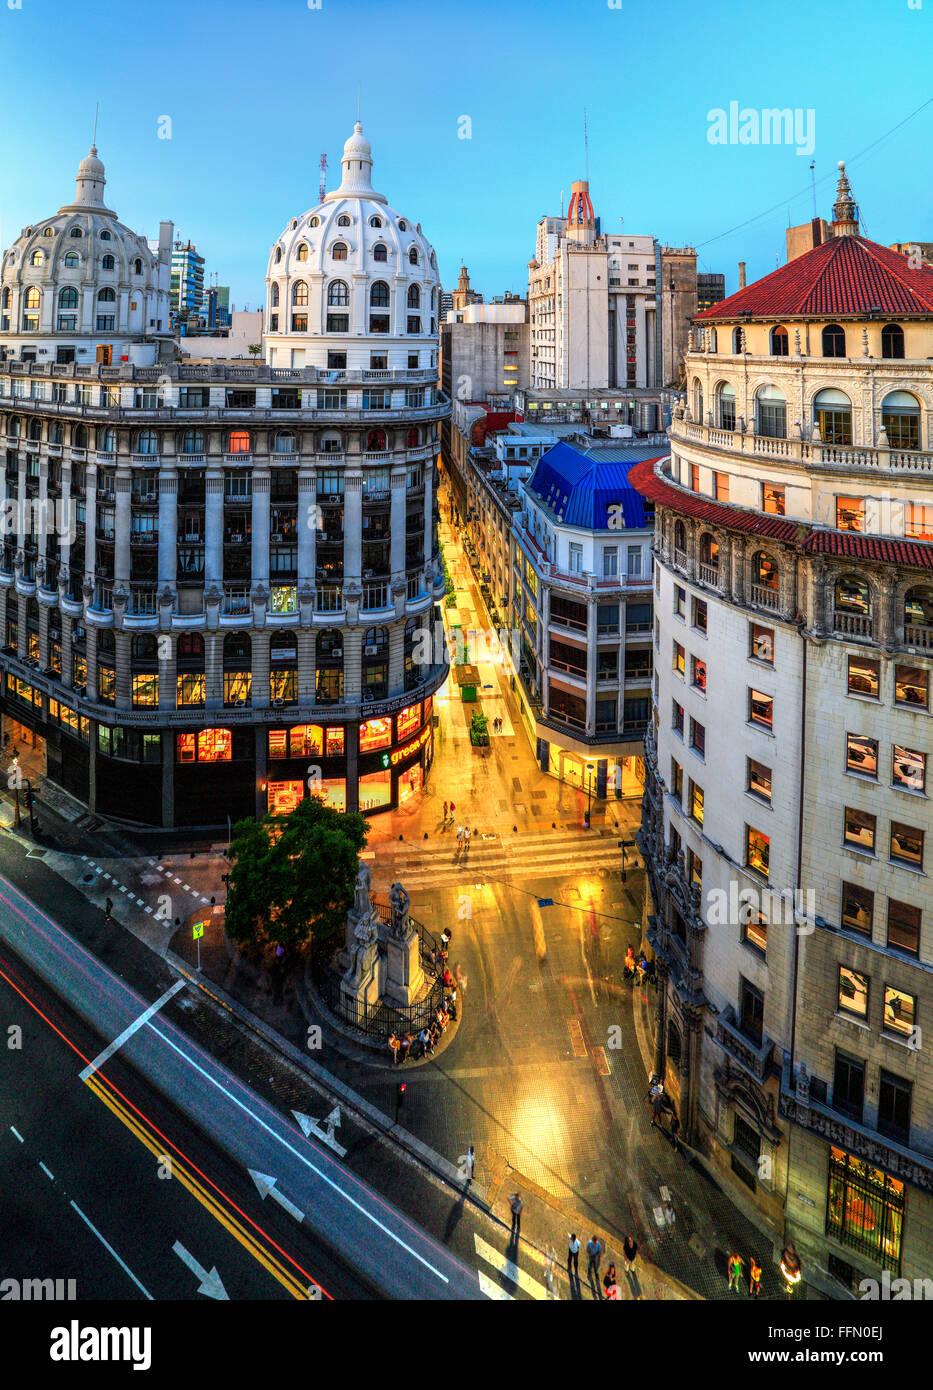 Vista aerea della Florida (pedonale) Street. Buenos Aires, Argentina, Sud America Immagini Stock